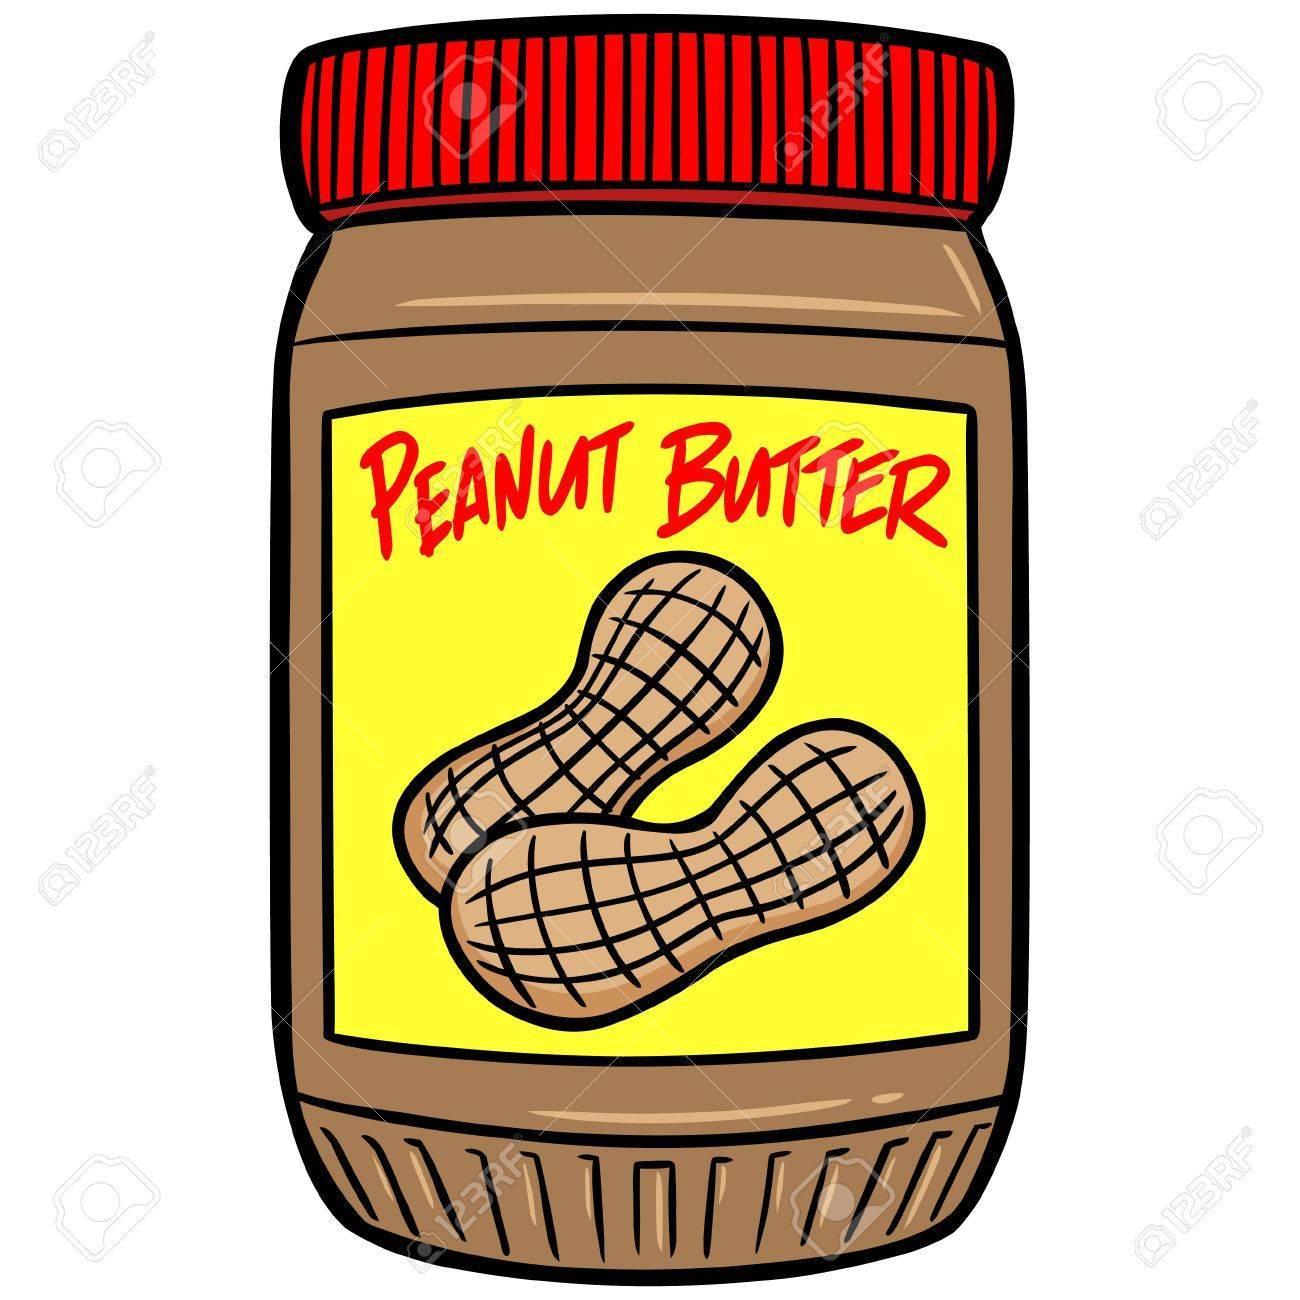 Free clipart peanut butter 5 » Clipart Portal.